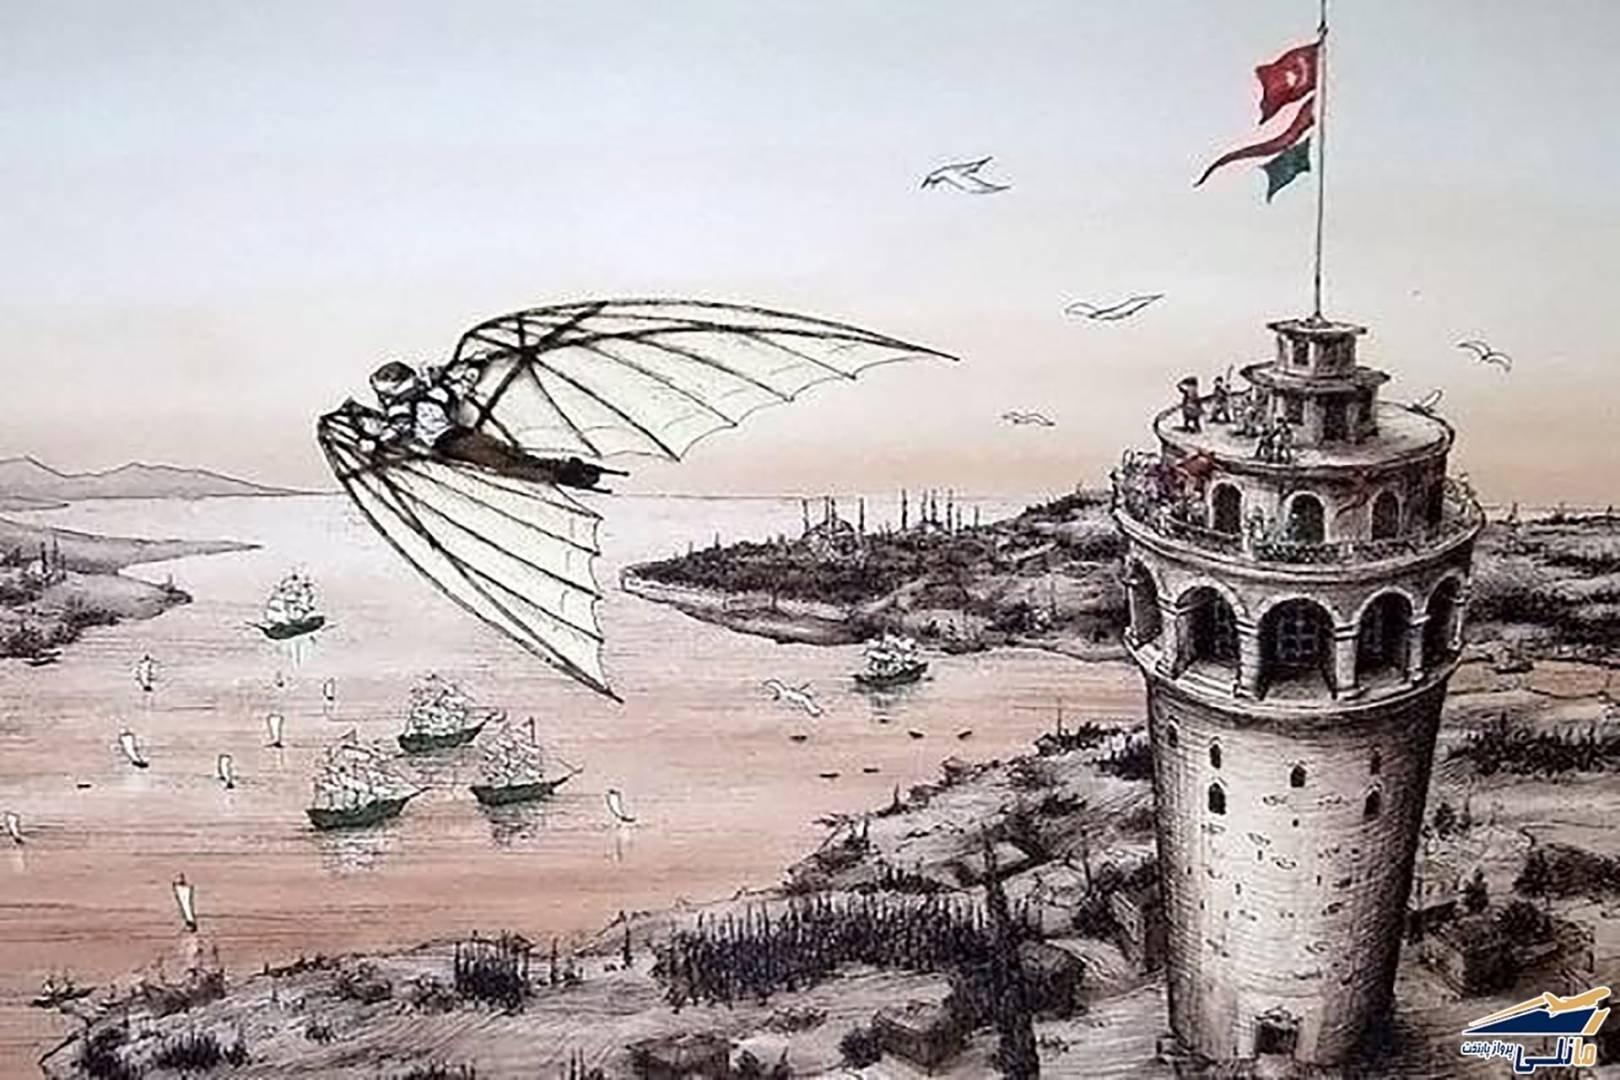 An illustration depicting Hazerfen Ahmet Çelebi's historic flight from the Galata Tower.